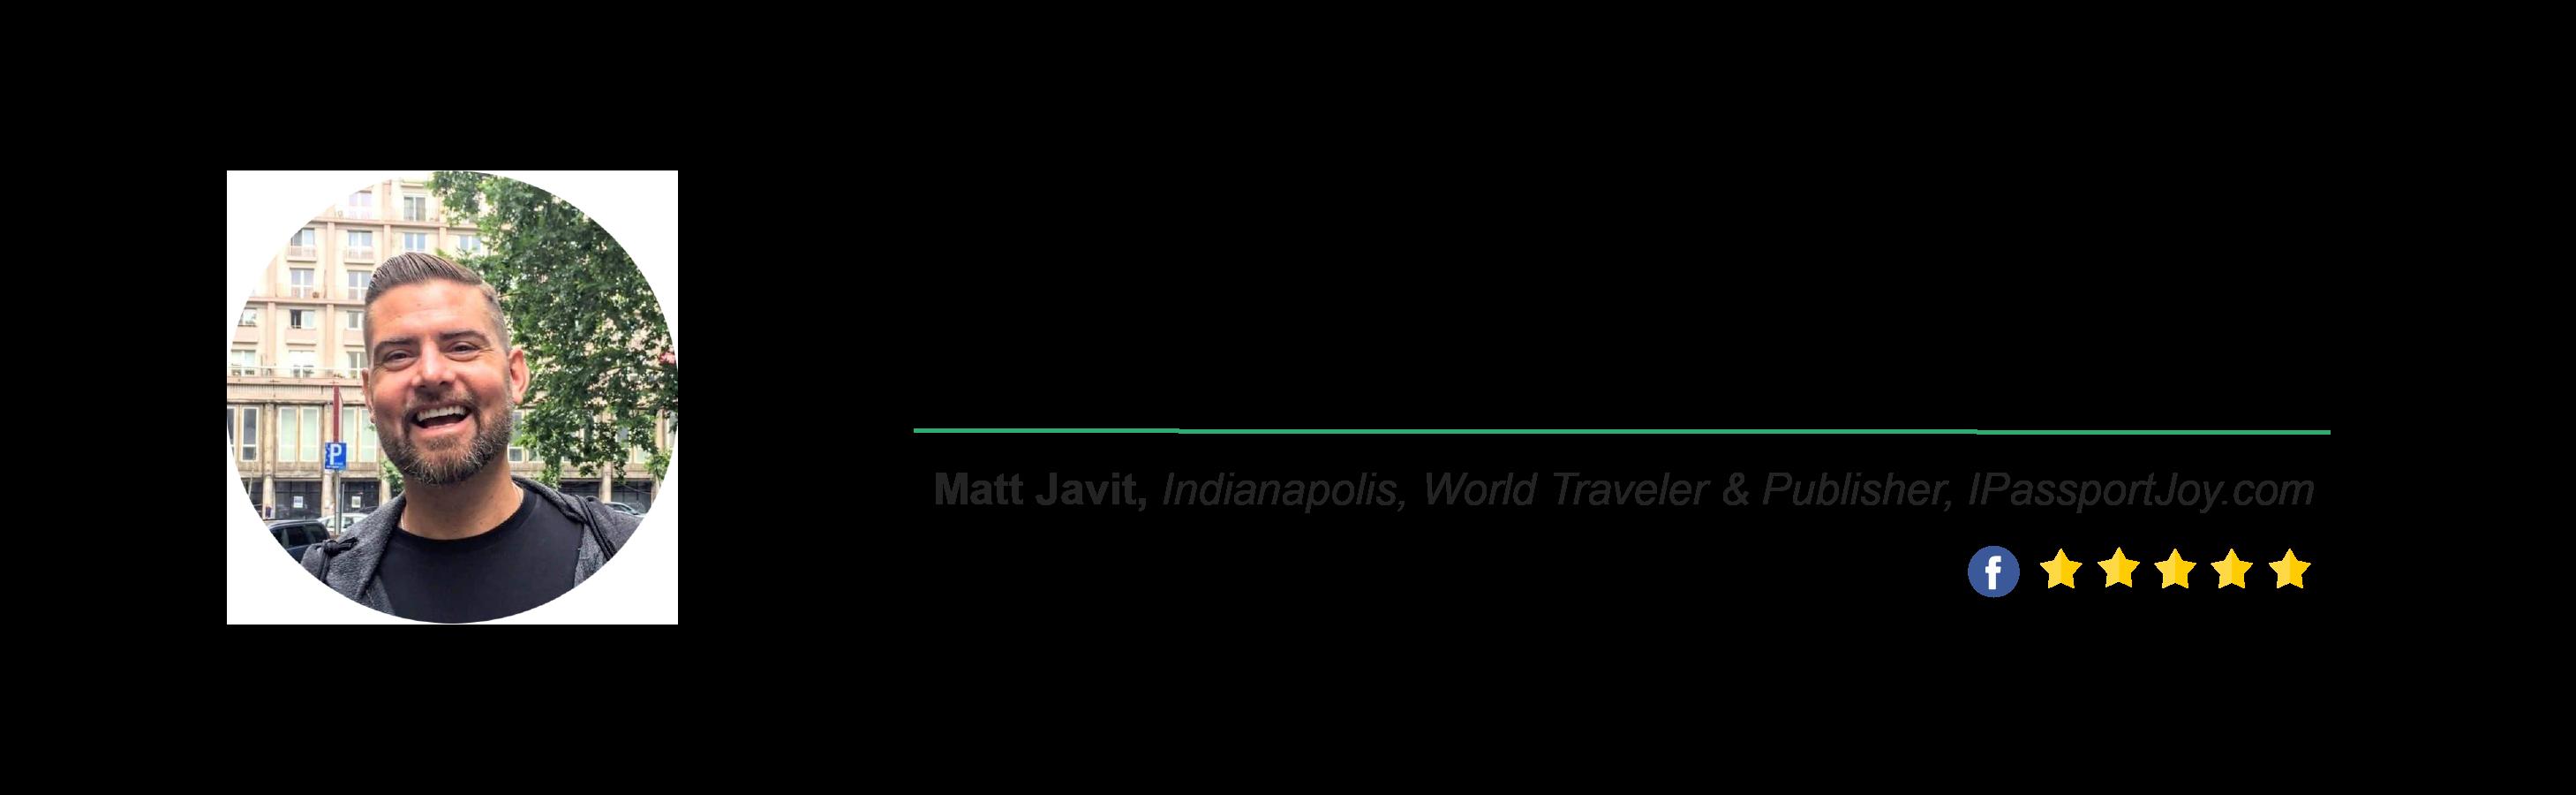 Locus Testimonial - Matt Javit